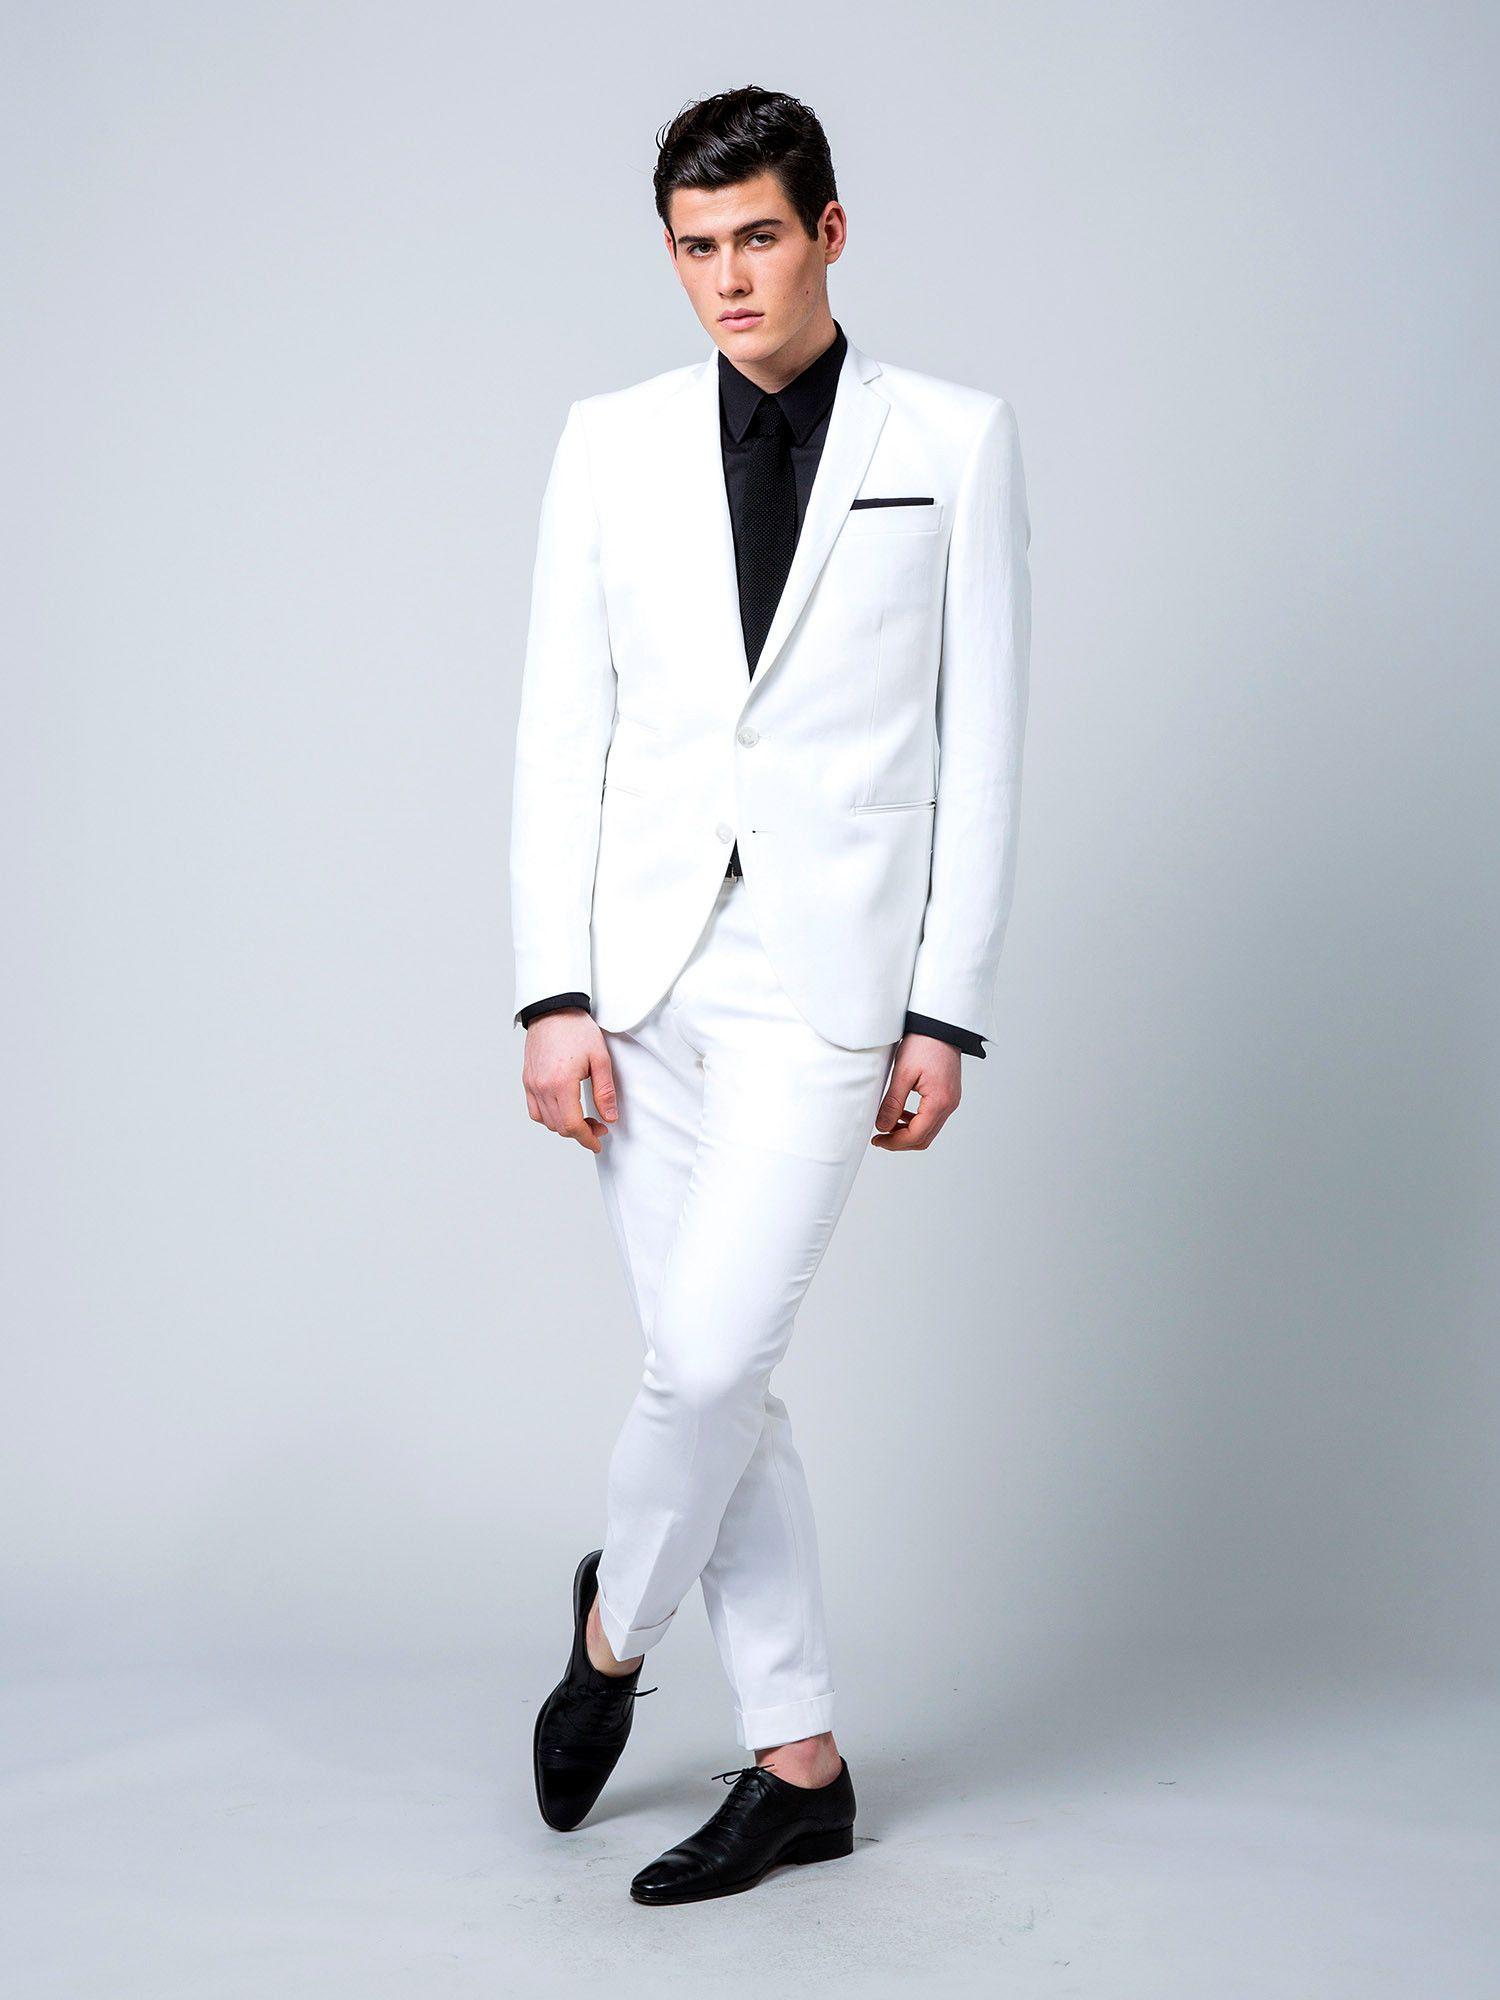 Costume Blanc Homme Luxury Samson Costumes Sur Mesure